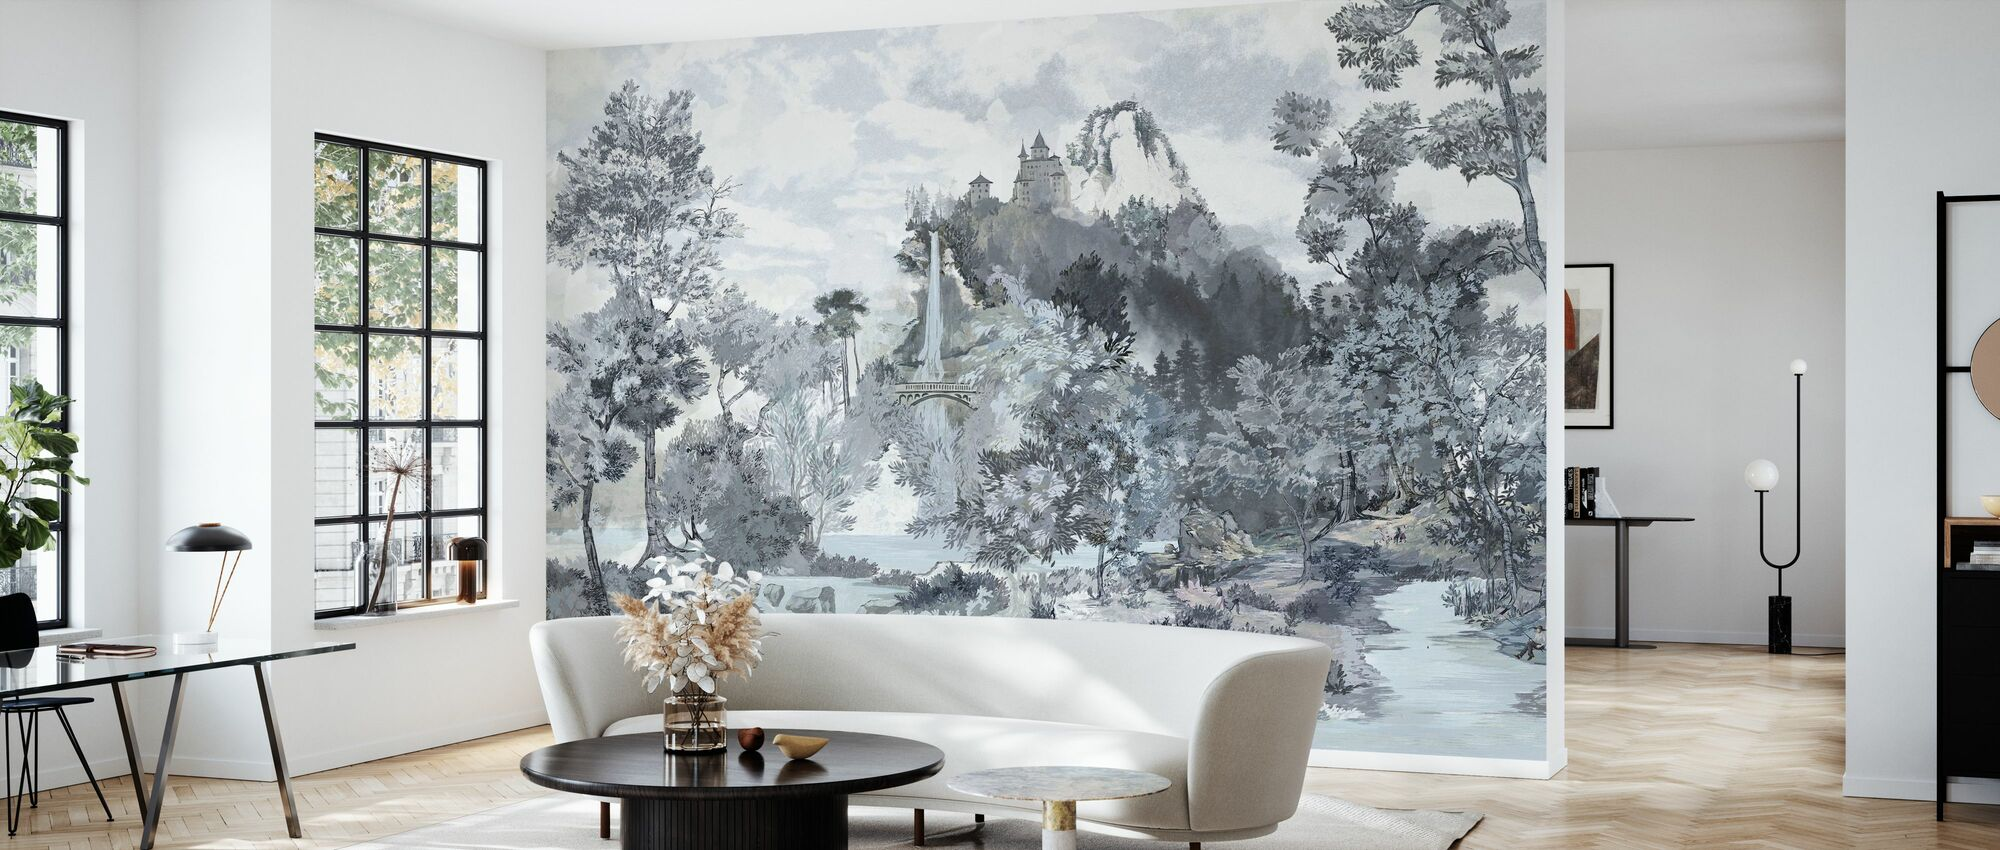 Fairytale Scenery II - Wallpaper - Living Room